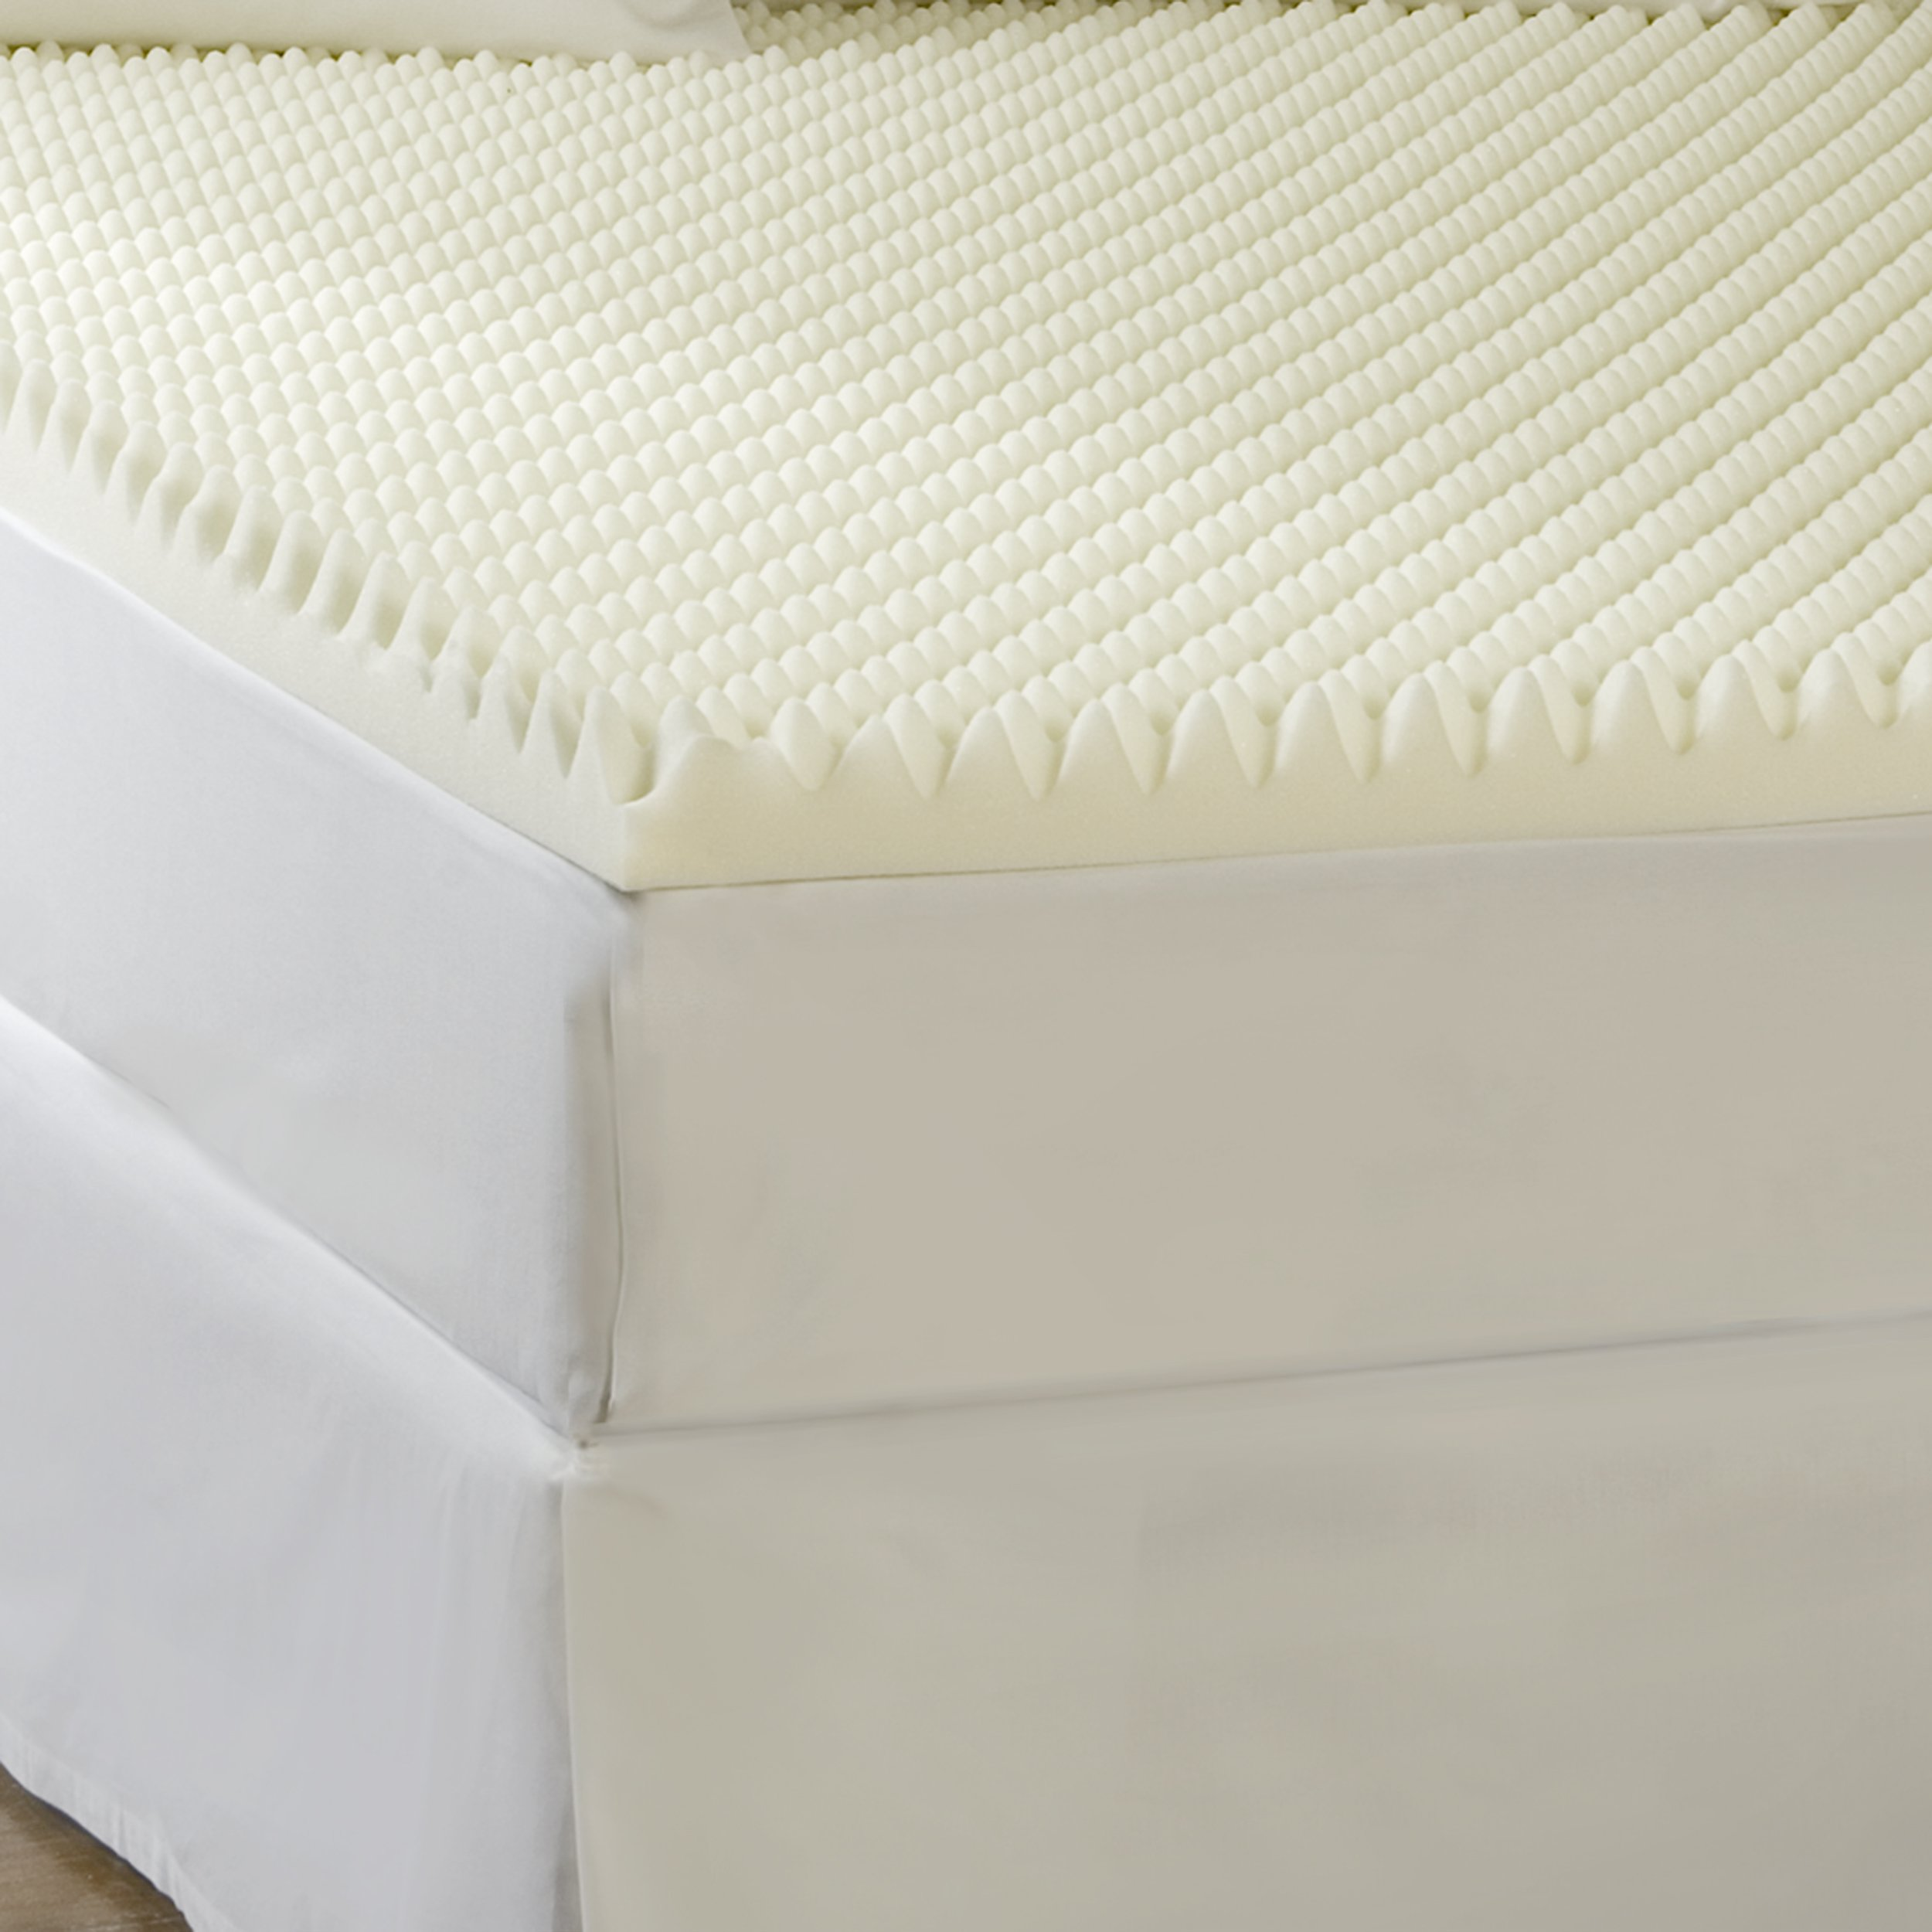 Sleep Comfort 2-Inch High Loft Eco Memory Foam Toppers, Twin